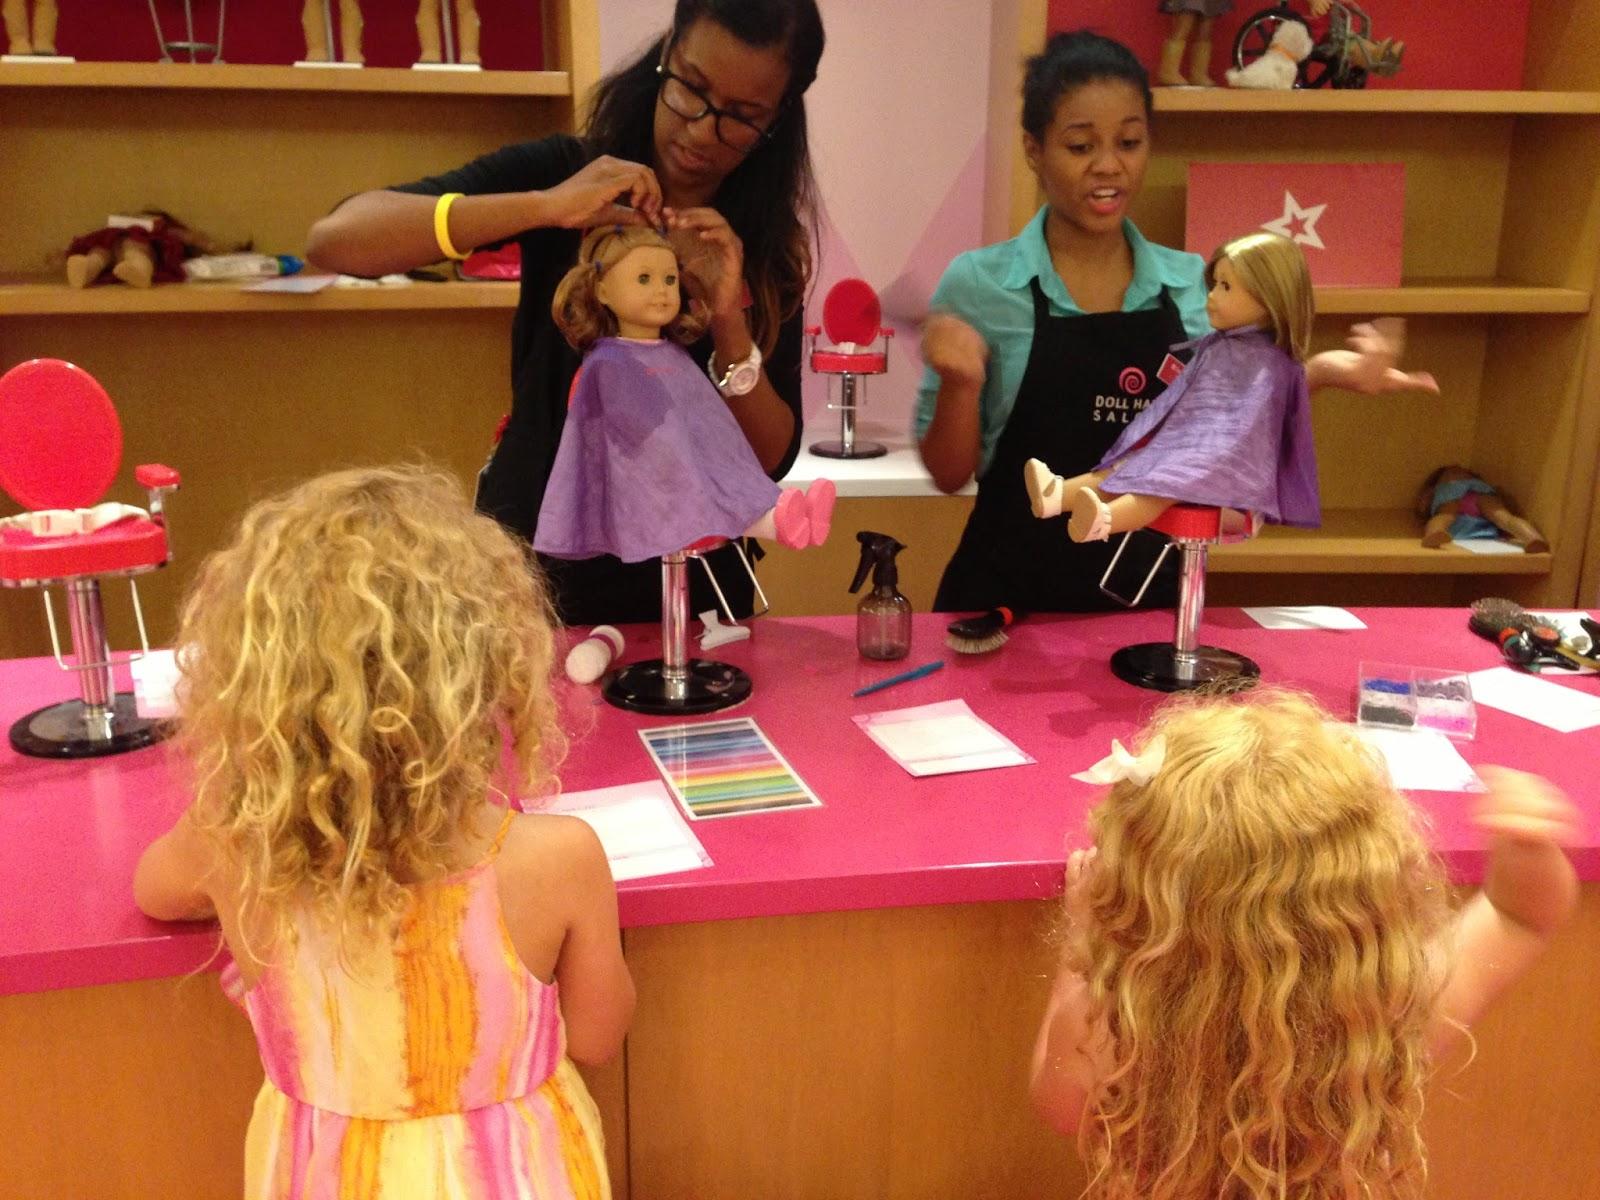 Cute Black Girl Hairstyles Short Hair Hair Is Our Crown - American girl doll hairstyle ideas